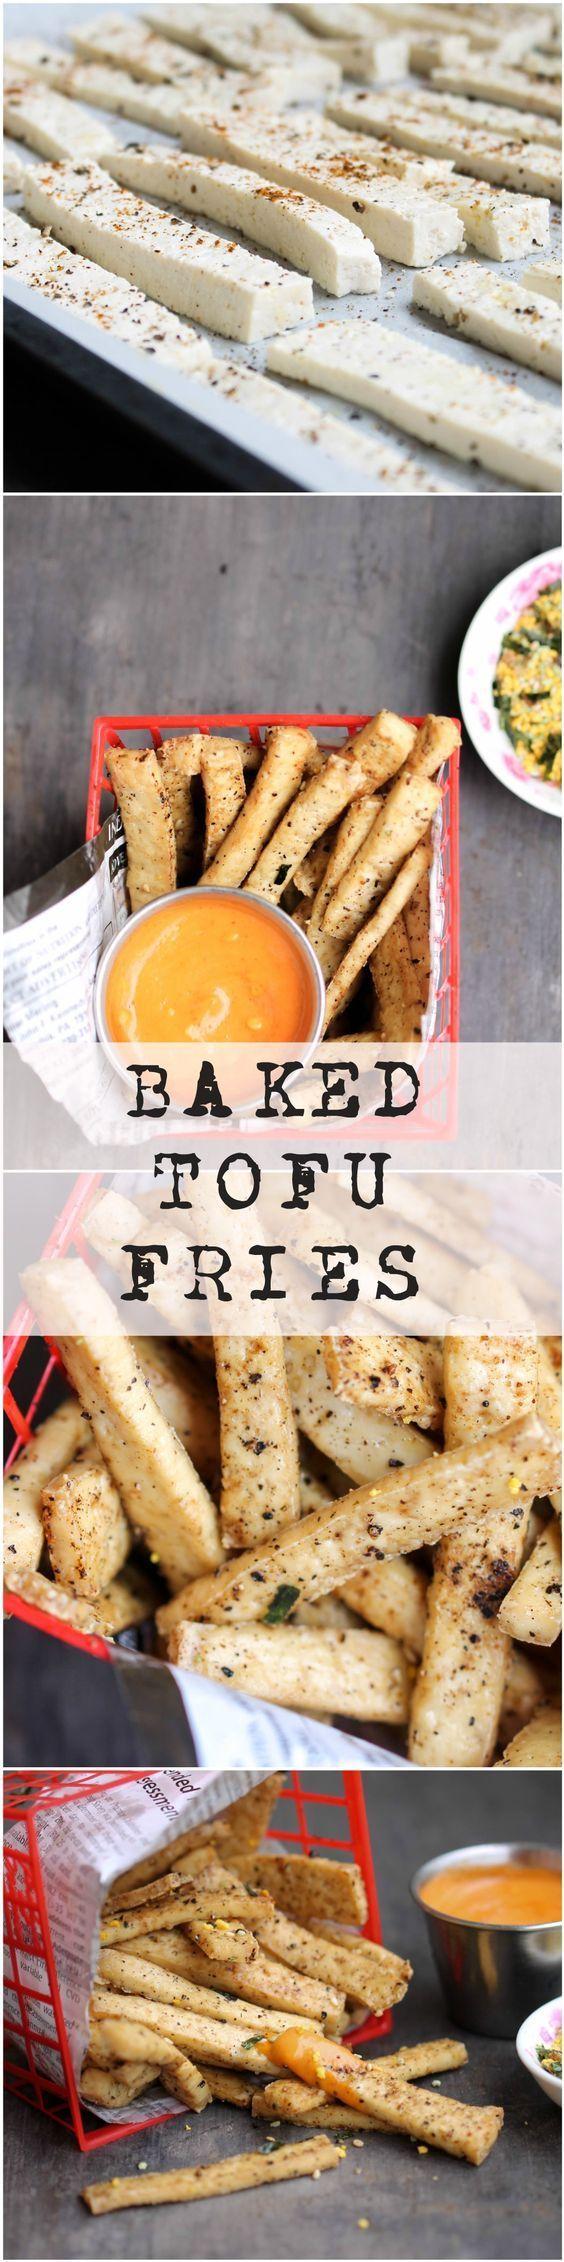 Baked Tofu Fries - Food, Pleasure, and Health                                                                                                                                                                                 More